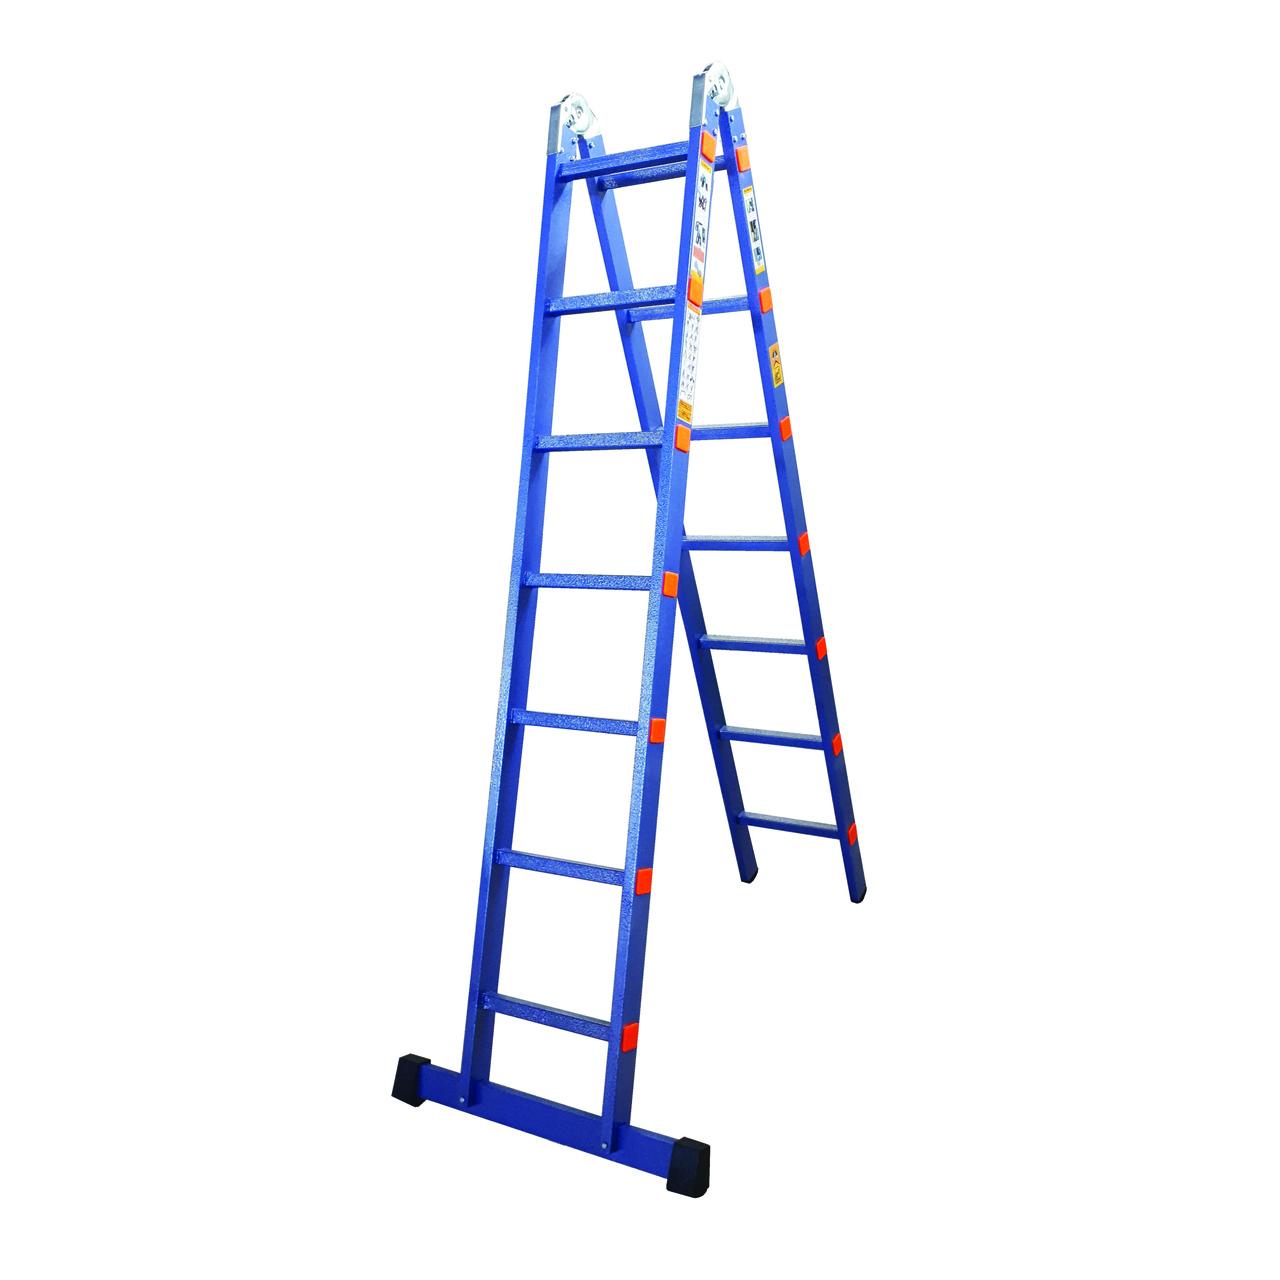 نردبان 14 پله مدل آسانکار As14p